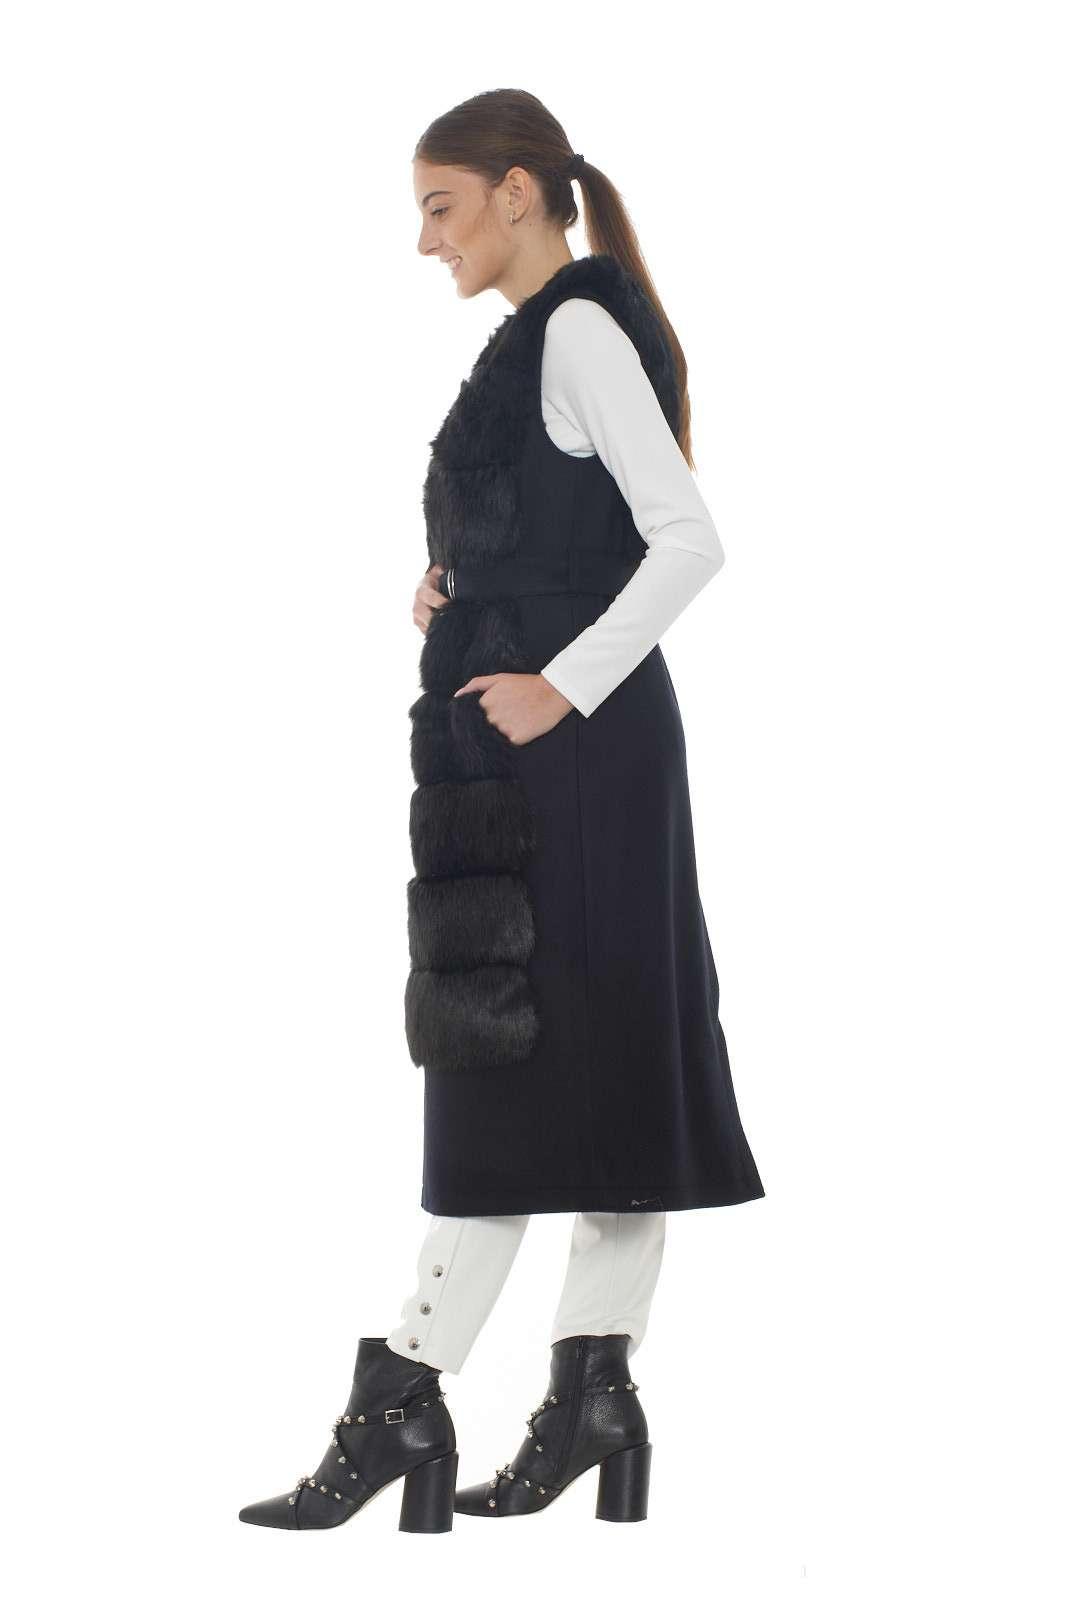 https://www.parmax.com/media/catalog/product/a/i/AI-outlet_parmax-cappotto-donna-Patrizia-Pepe-2l0844-B.jpg